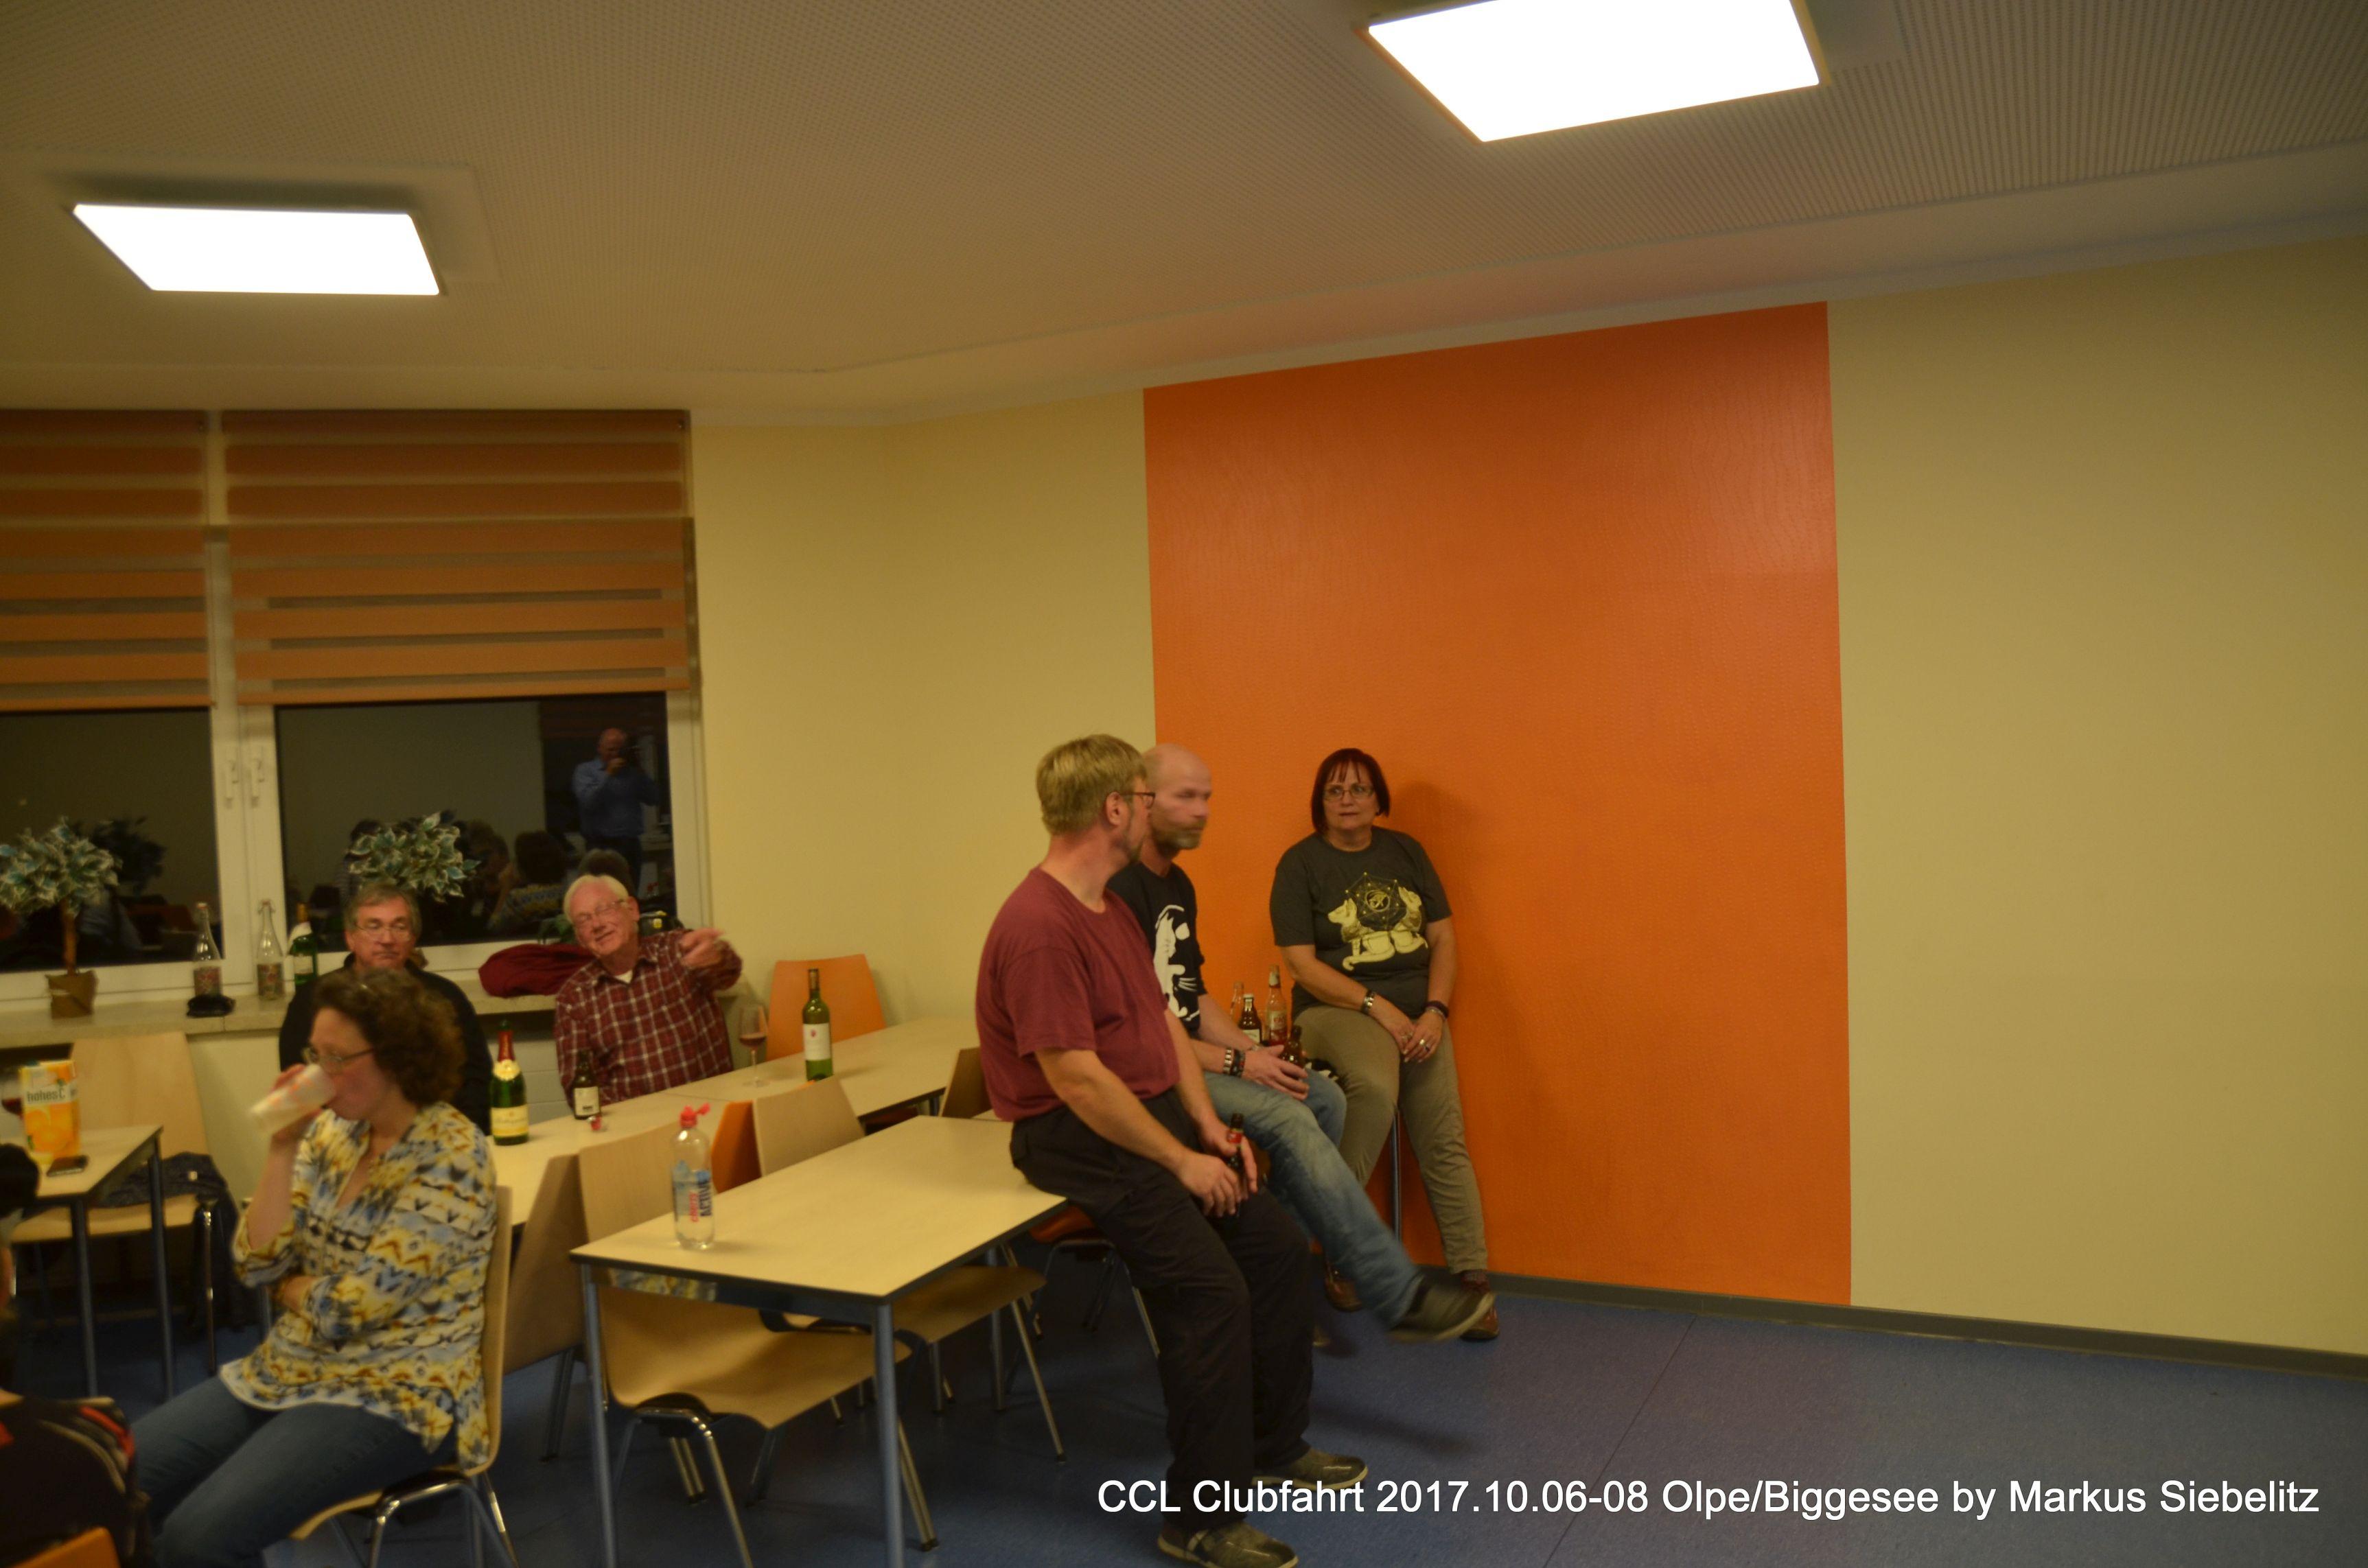 CCL Clubfahrt 2017.10.06-08 Biggesee (17)